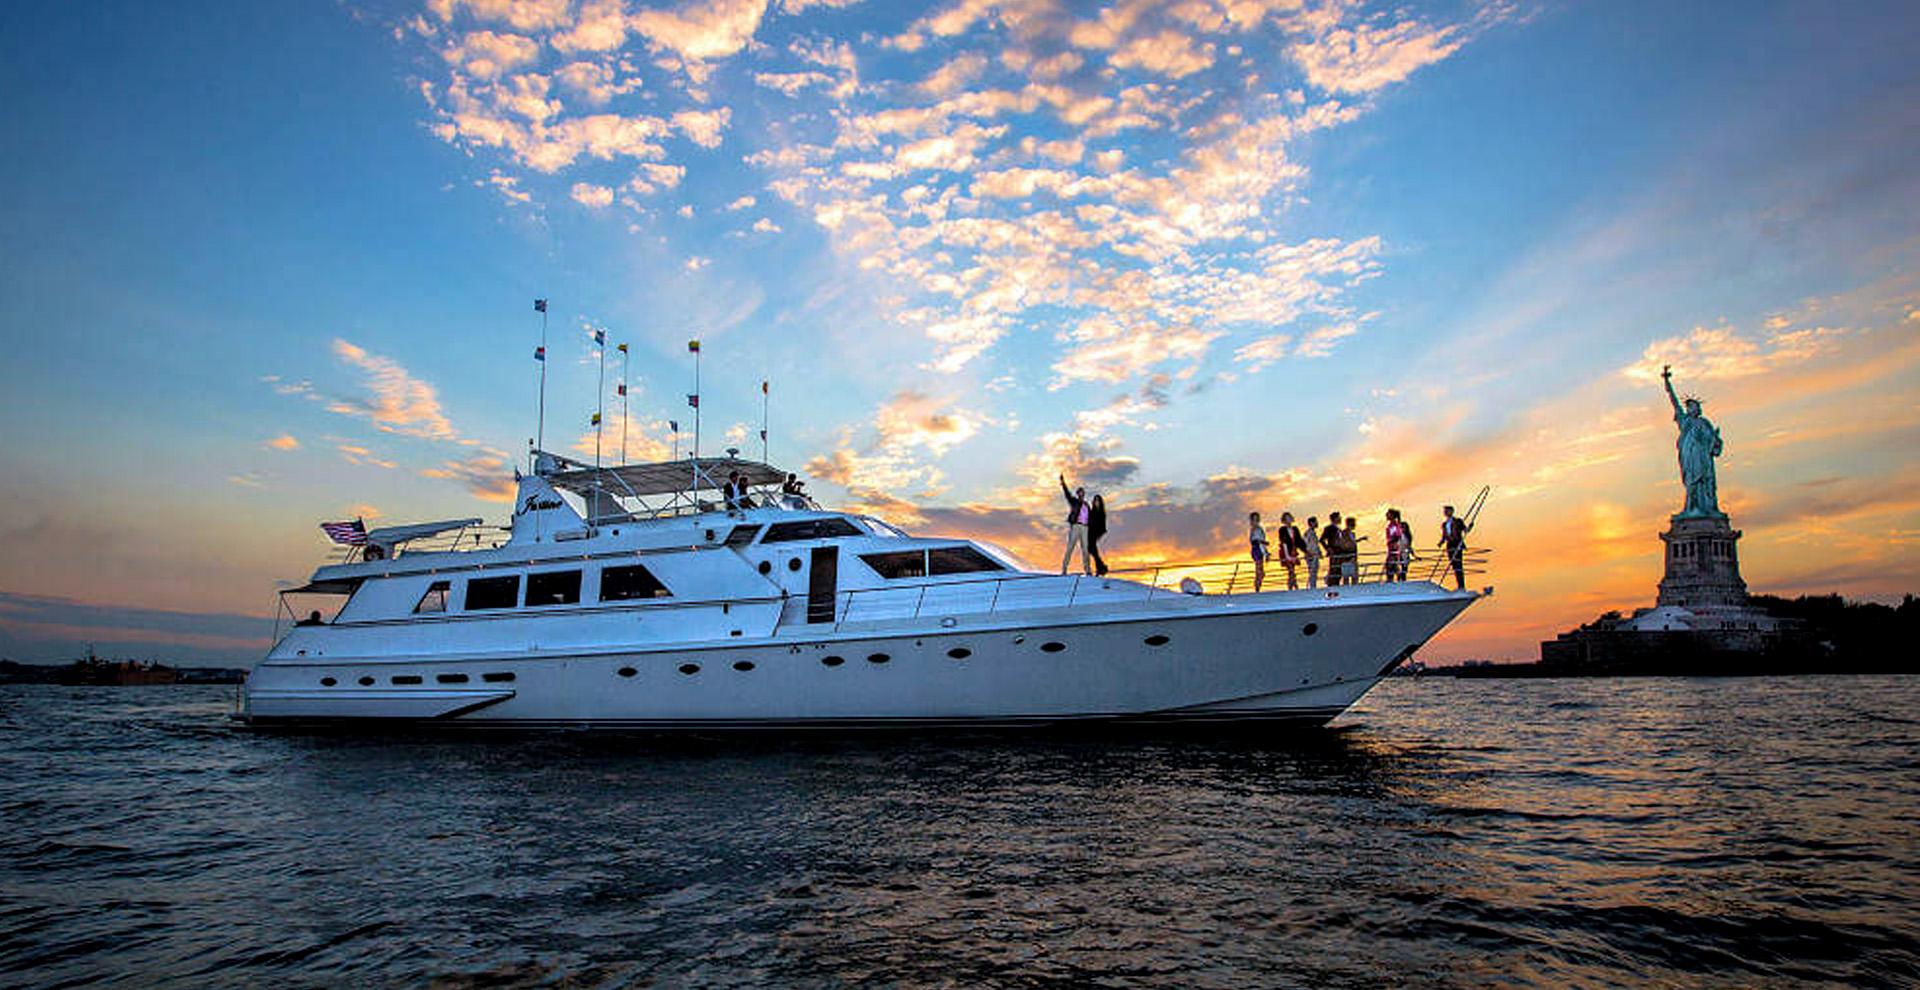 Del Rio Yacht Charter New York City Wedding Boat Party